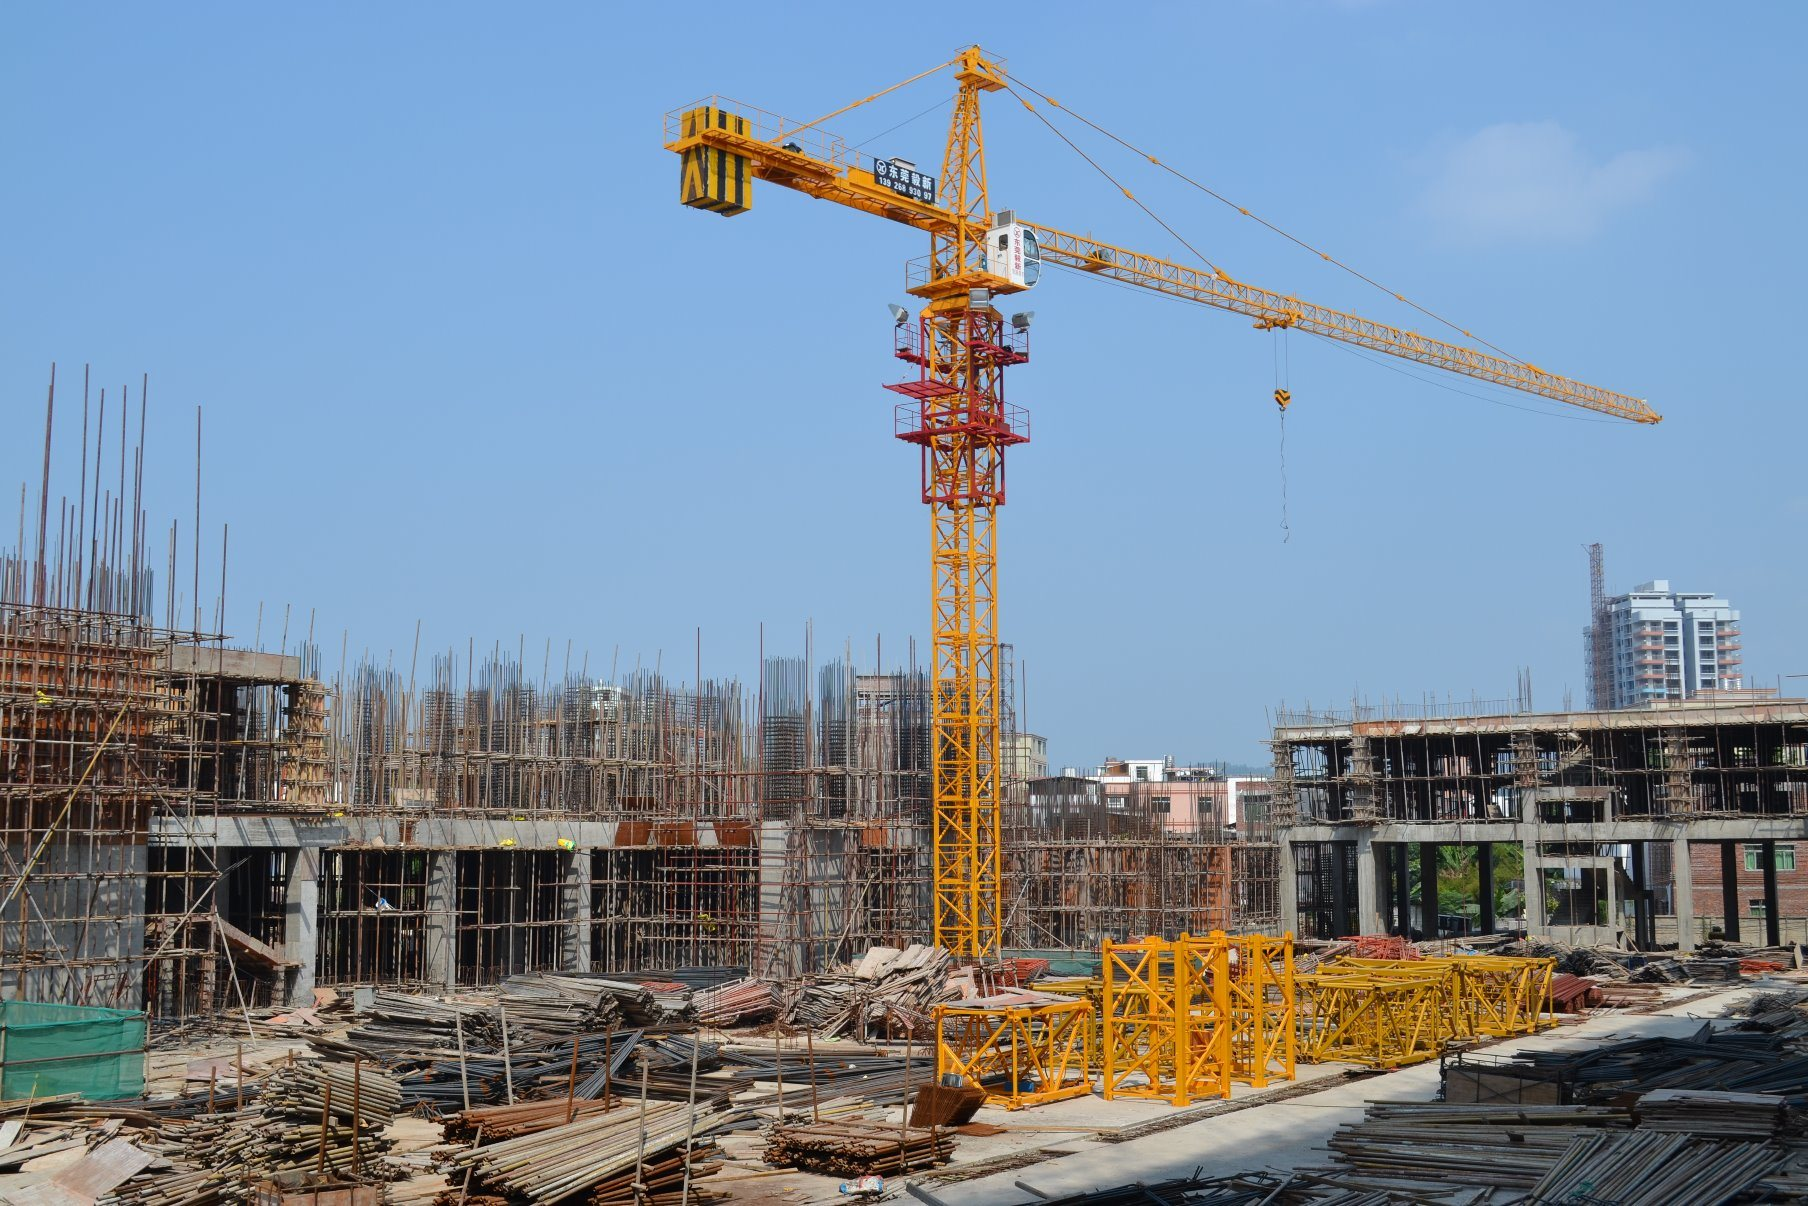 Qtz160 Self-Erecting Topless Construction Building Tower Crane